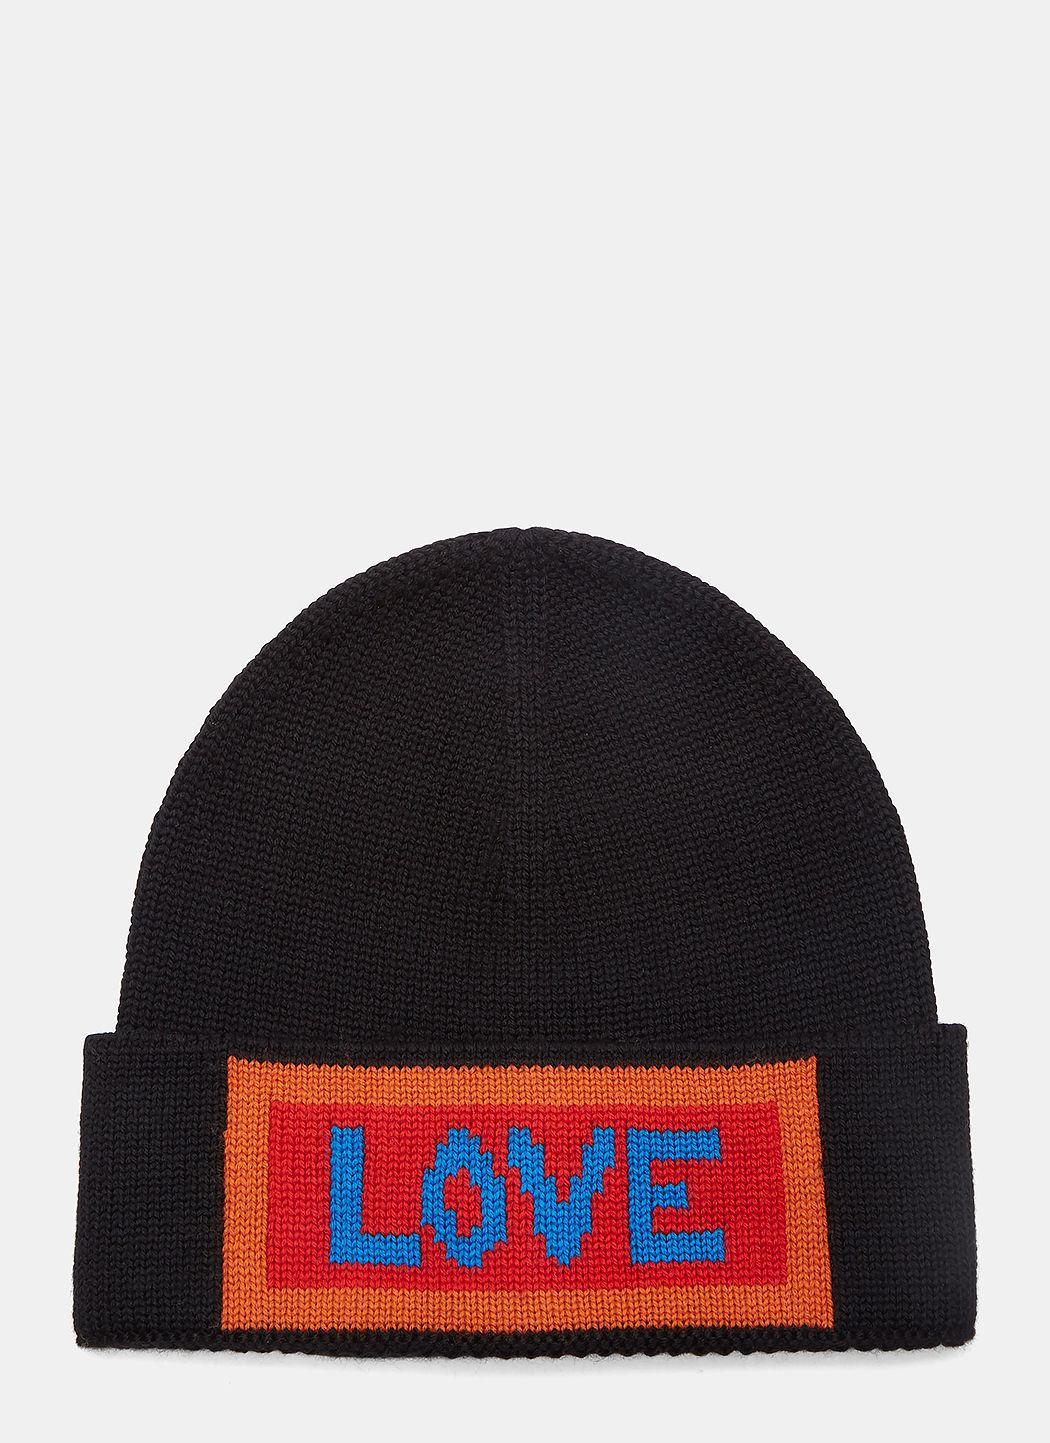 42d117dd09a35b Fendi Love Intarsia Knit Beanie Hat In Black | ModeSens